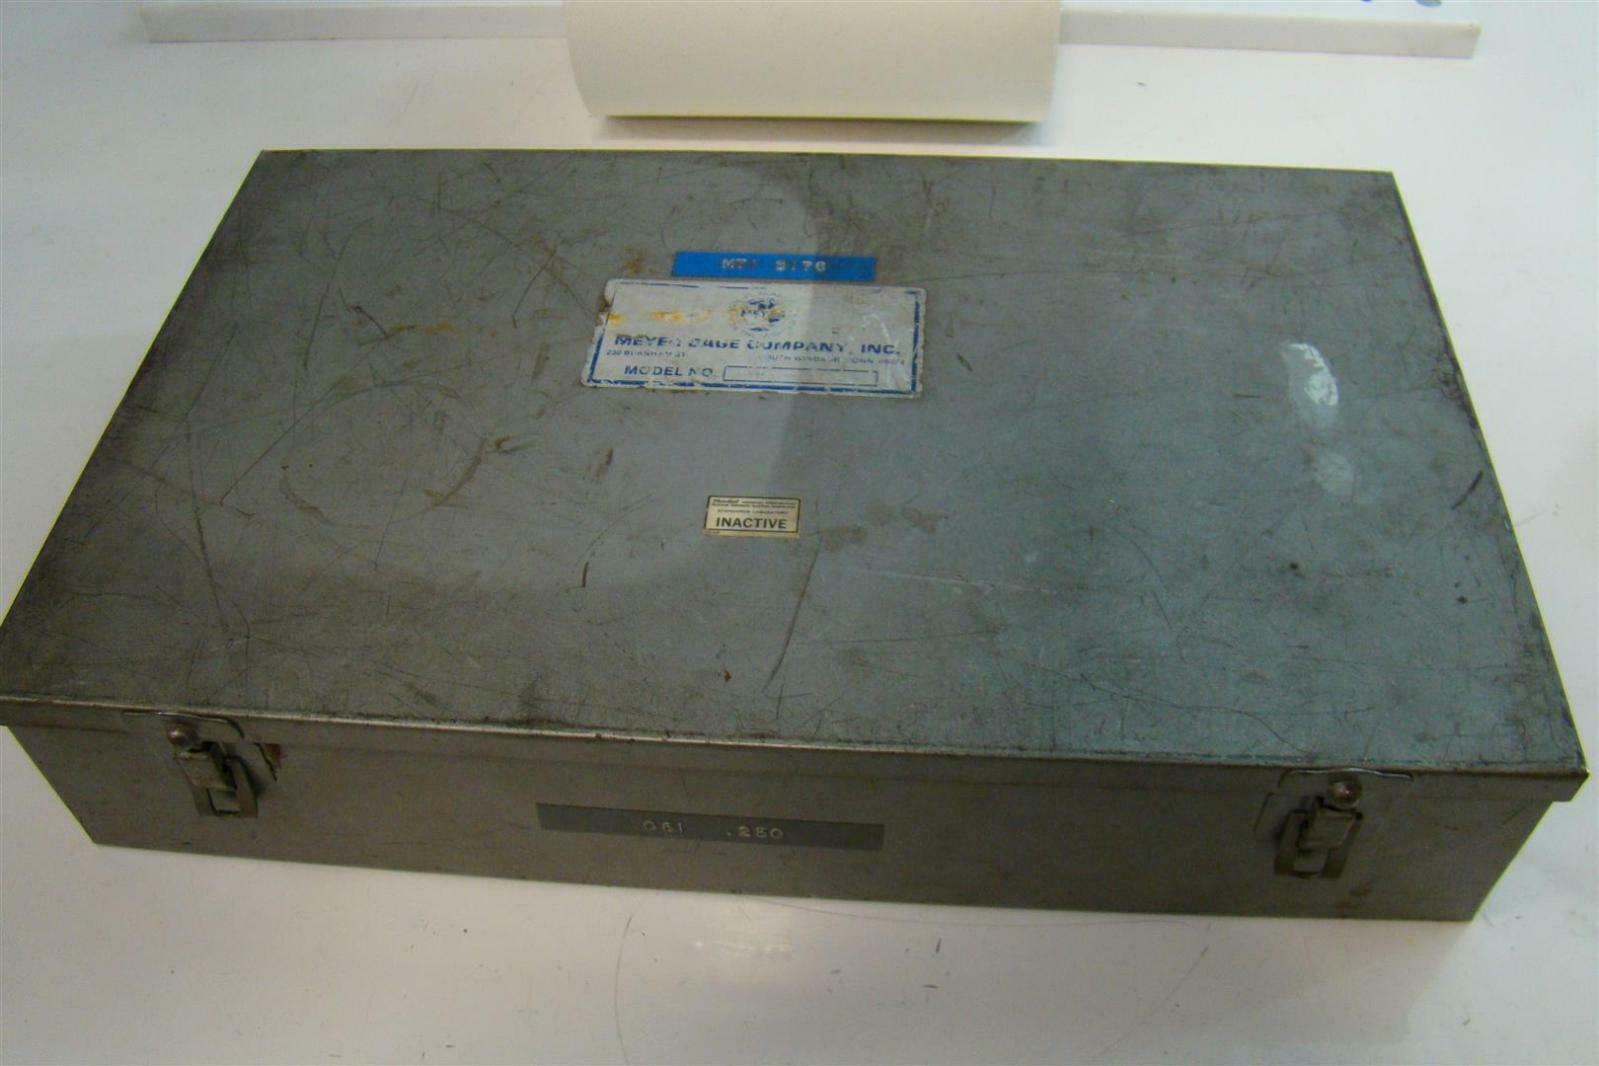 Meyer Gage M-1 PLUS .061 to .250 Plug Gage Set USED